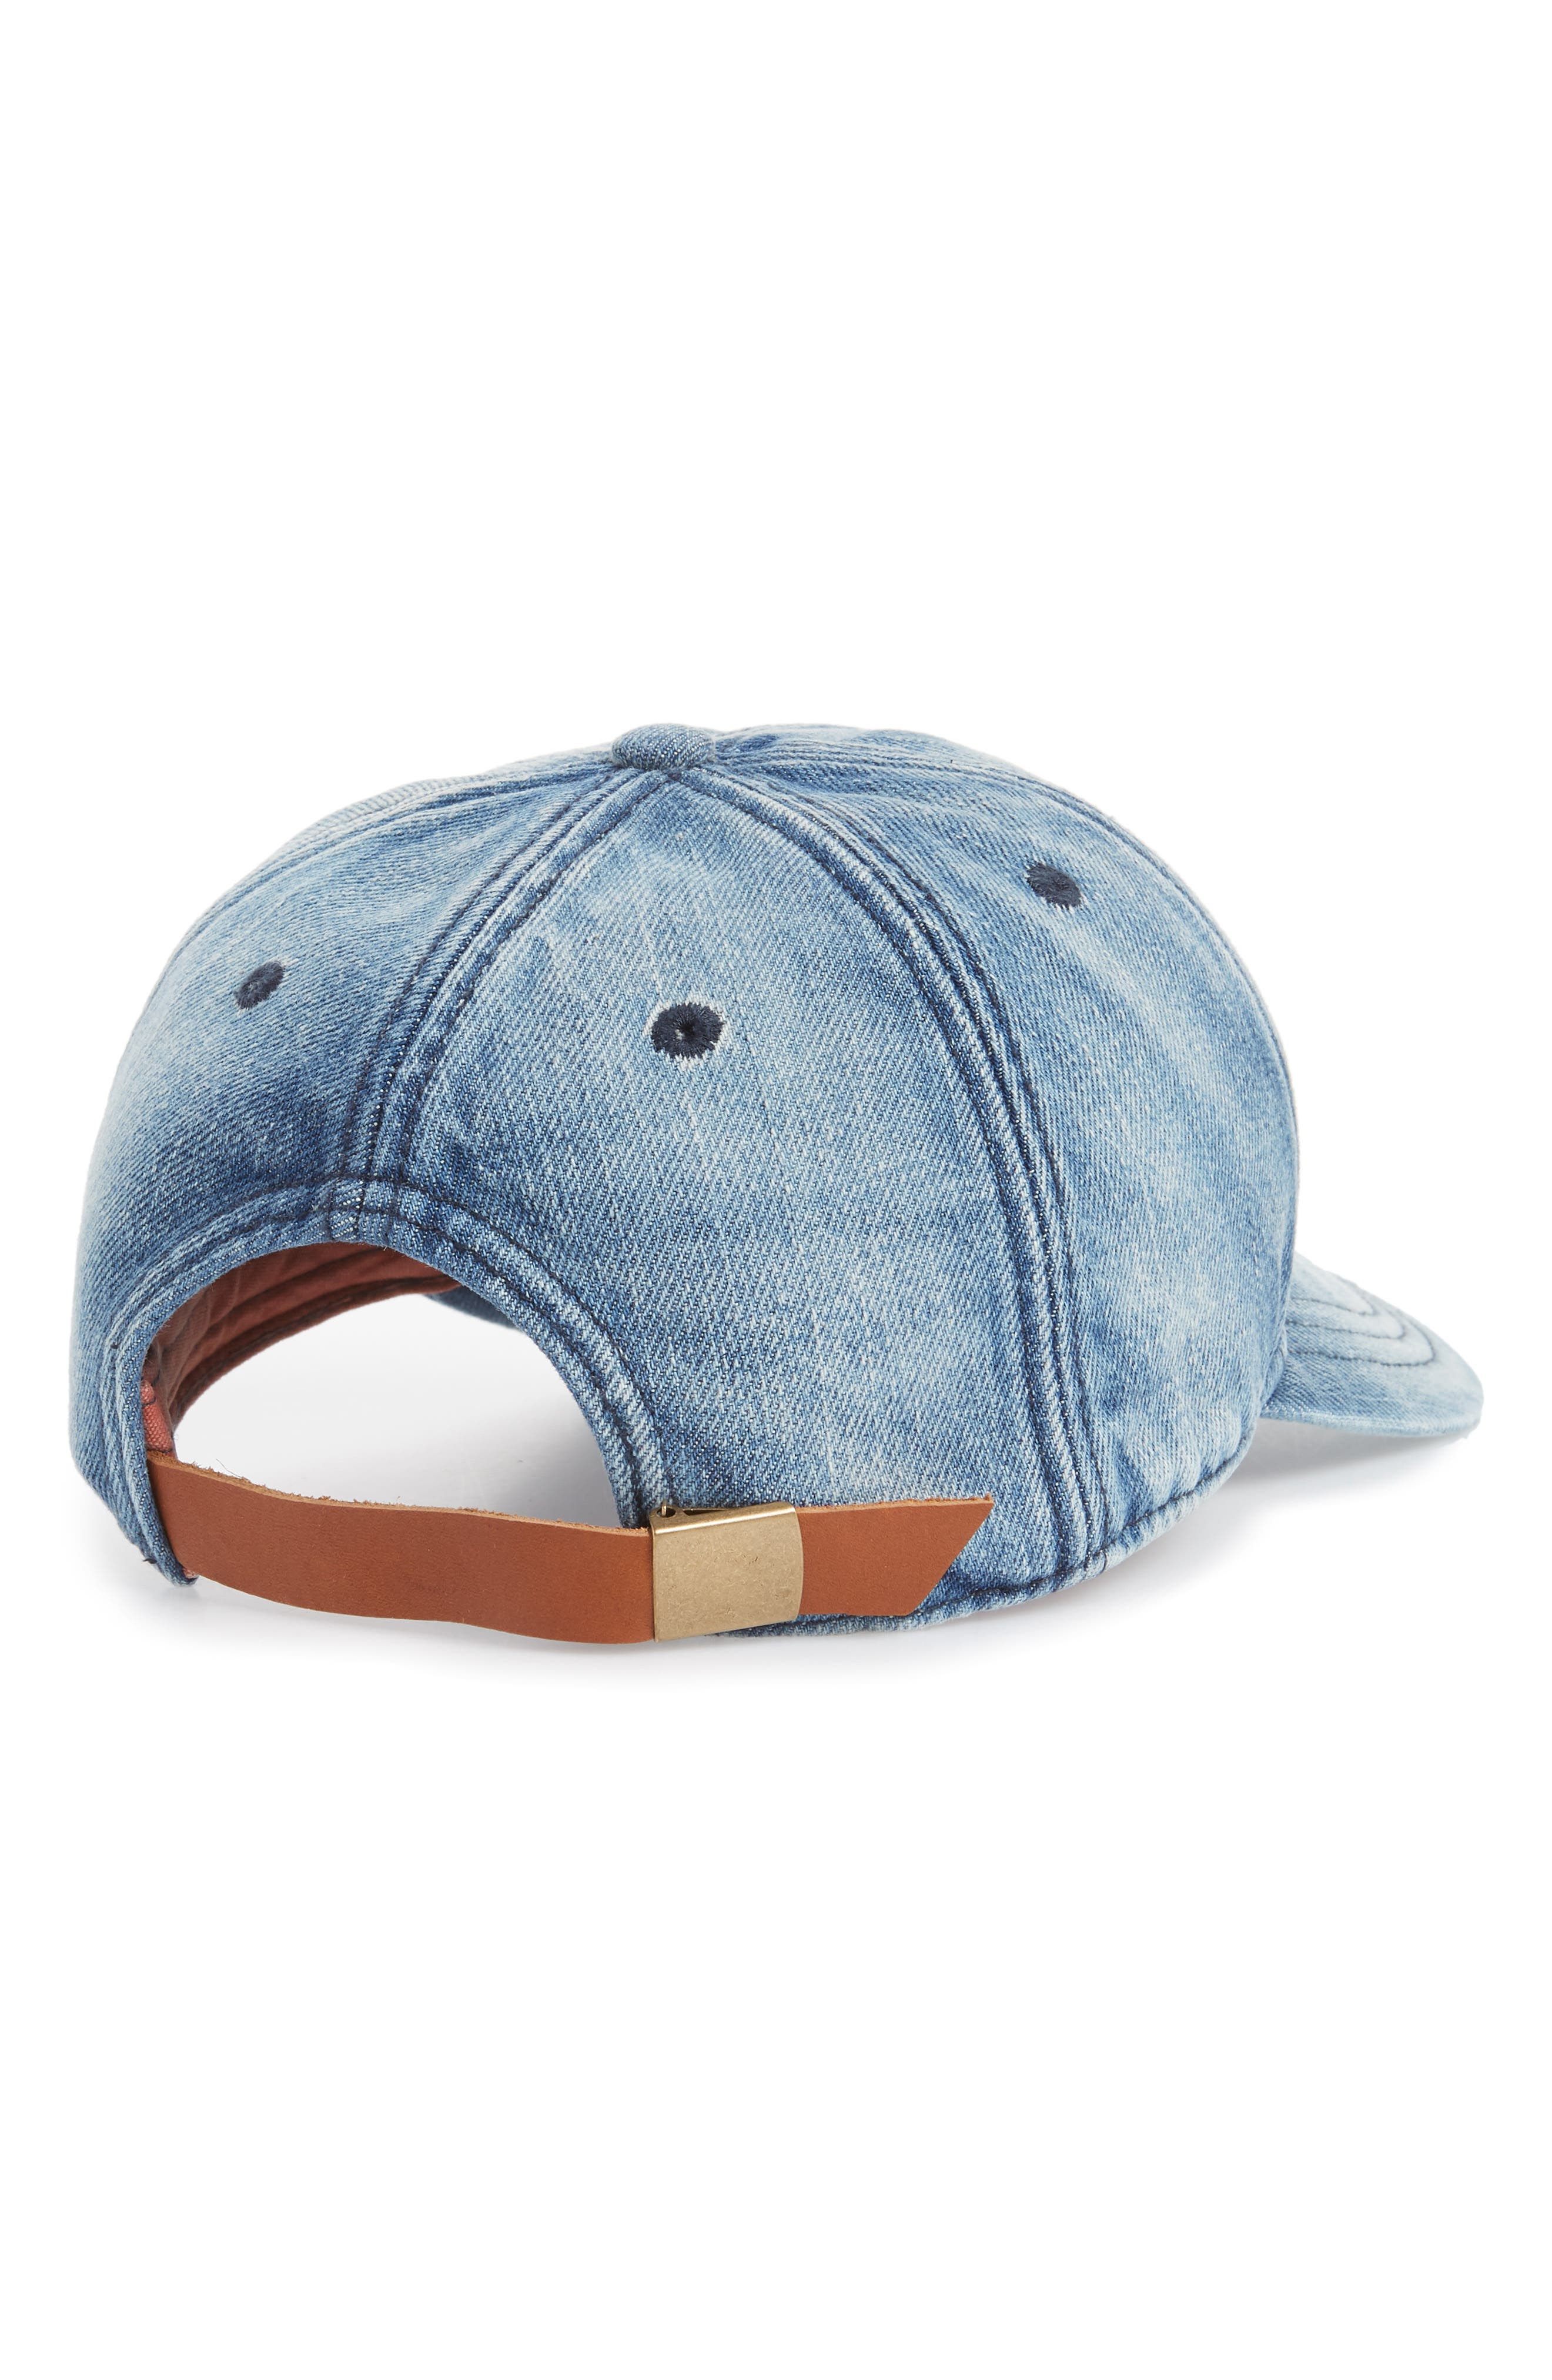 Baseball Cap Hats for Women  bfa2209a713